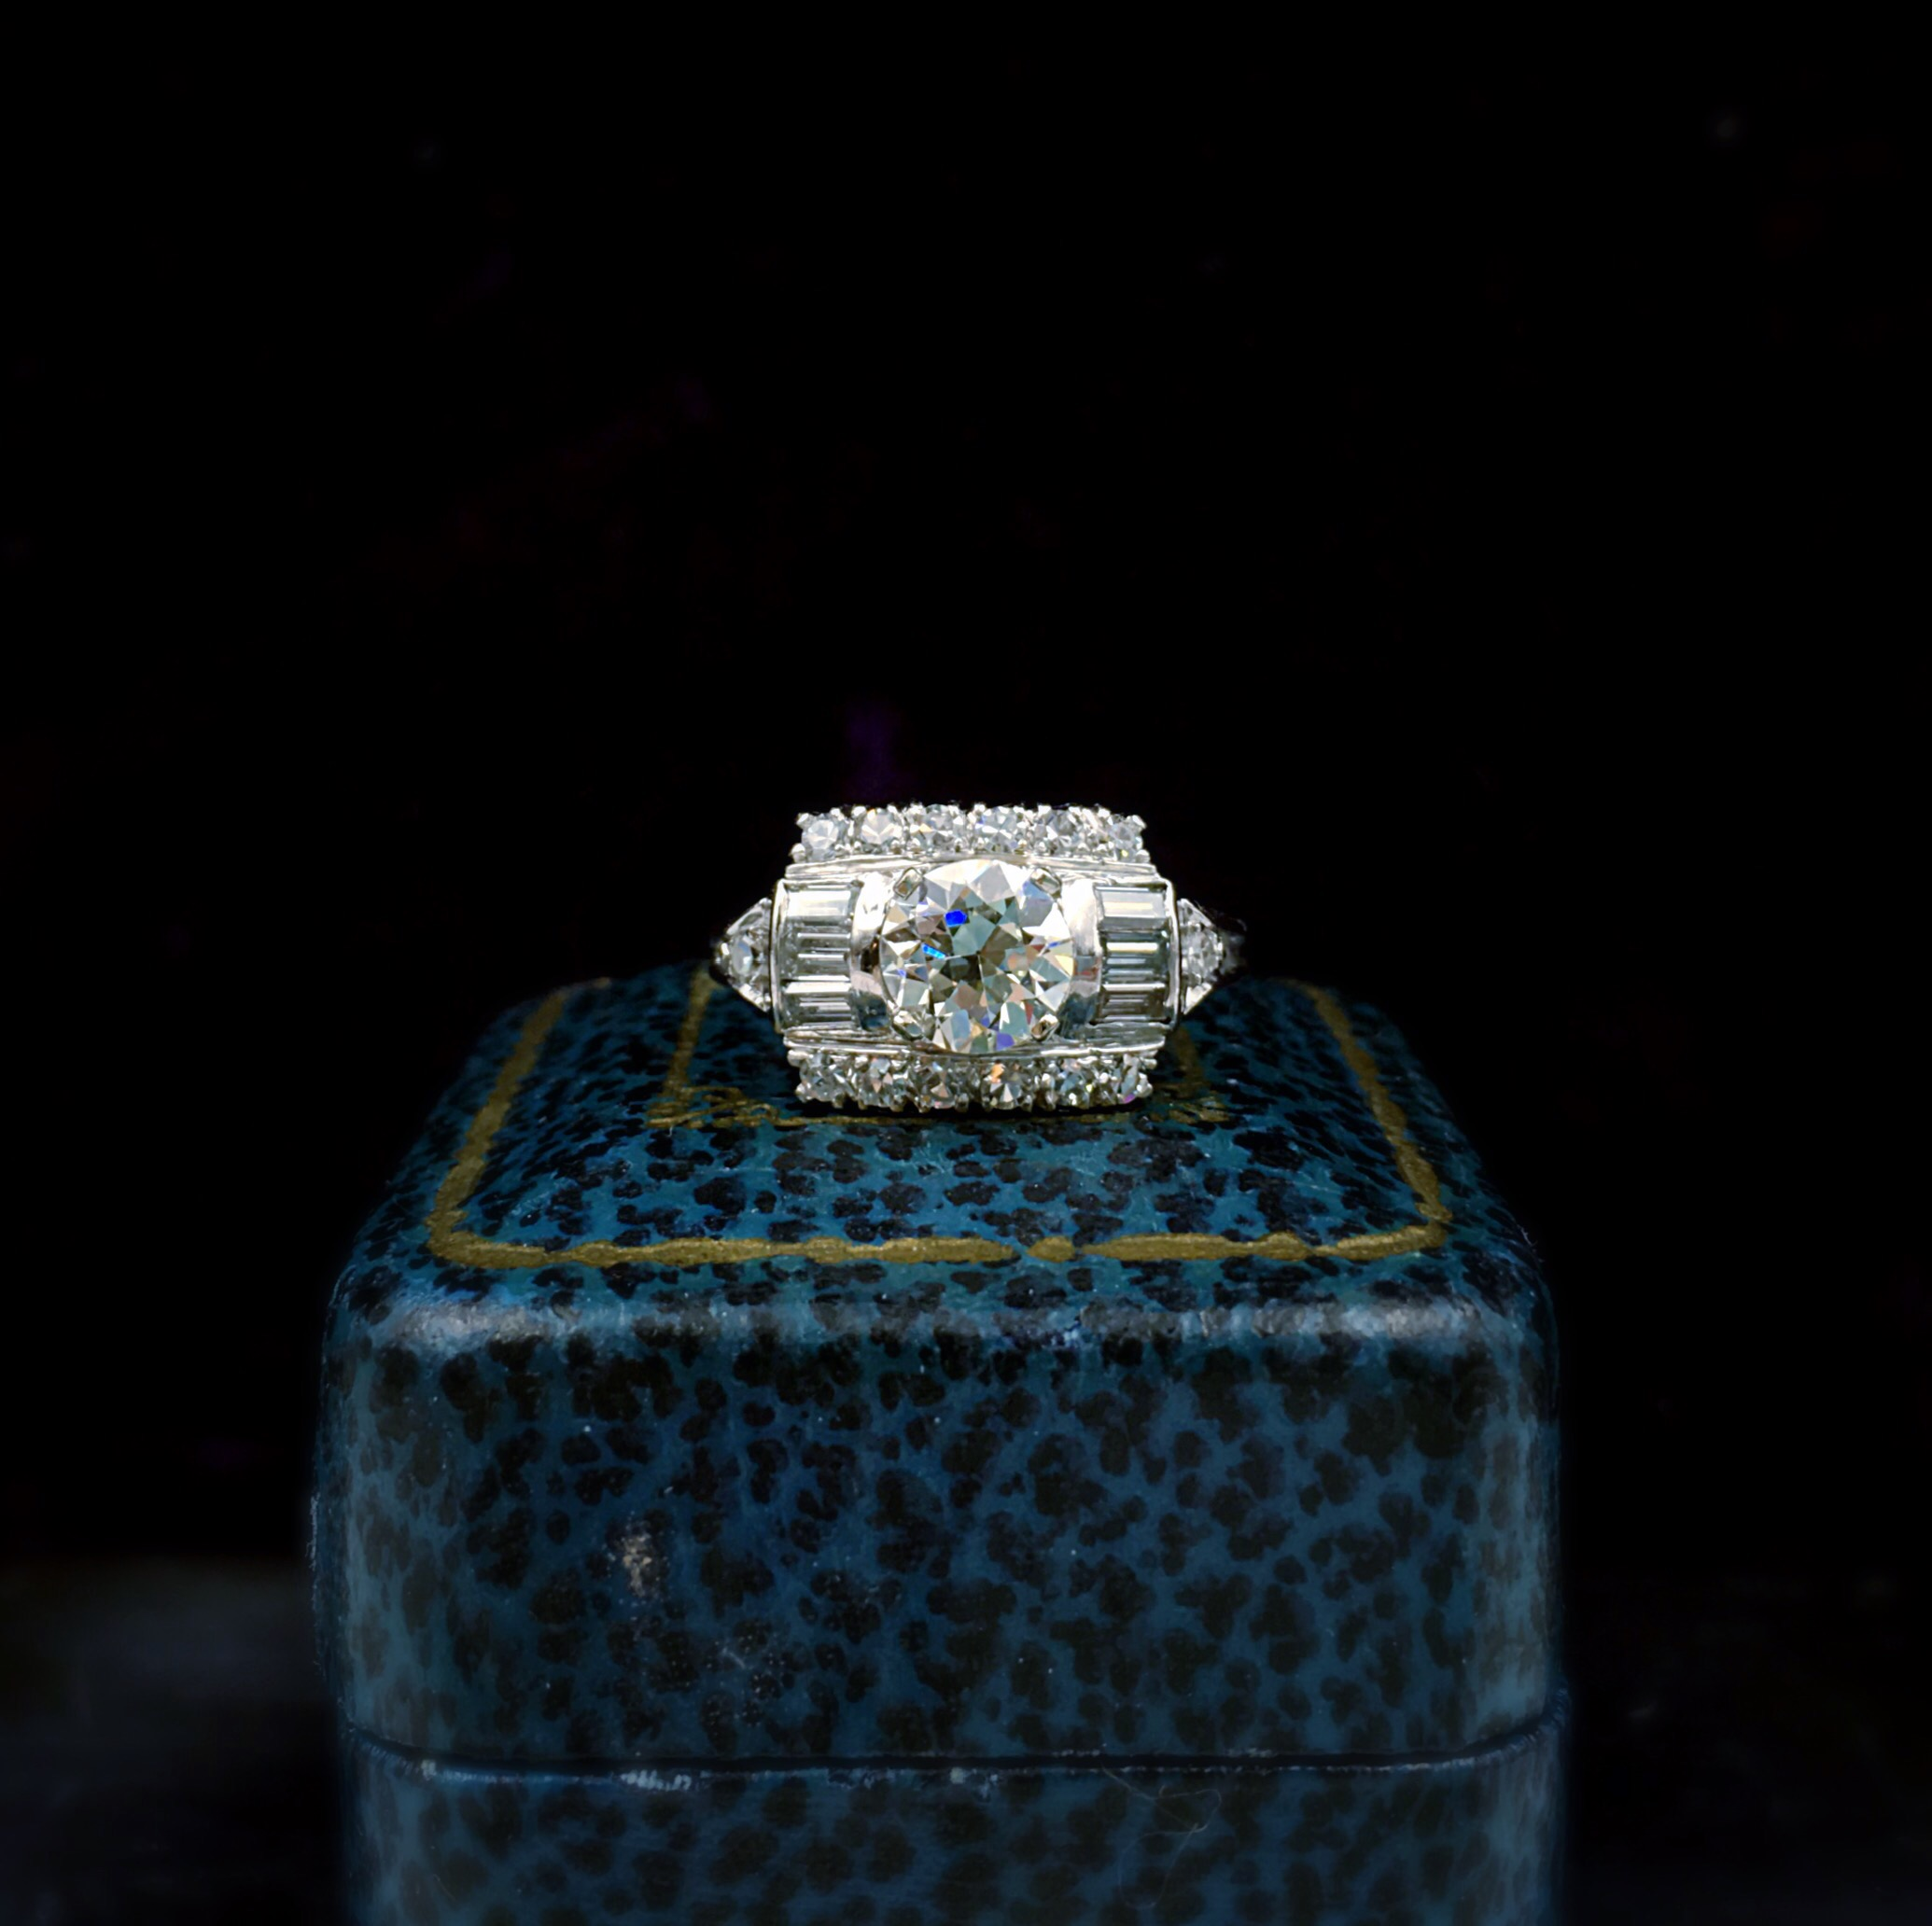 retro diamond engagement ring, reverie estate jewelry nyc